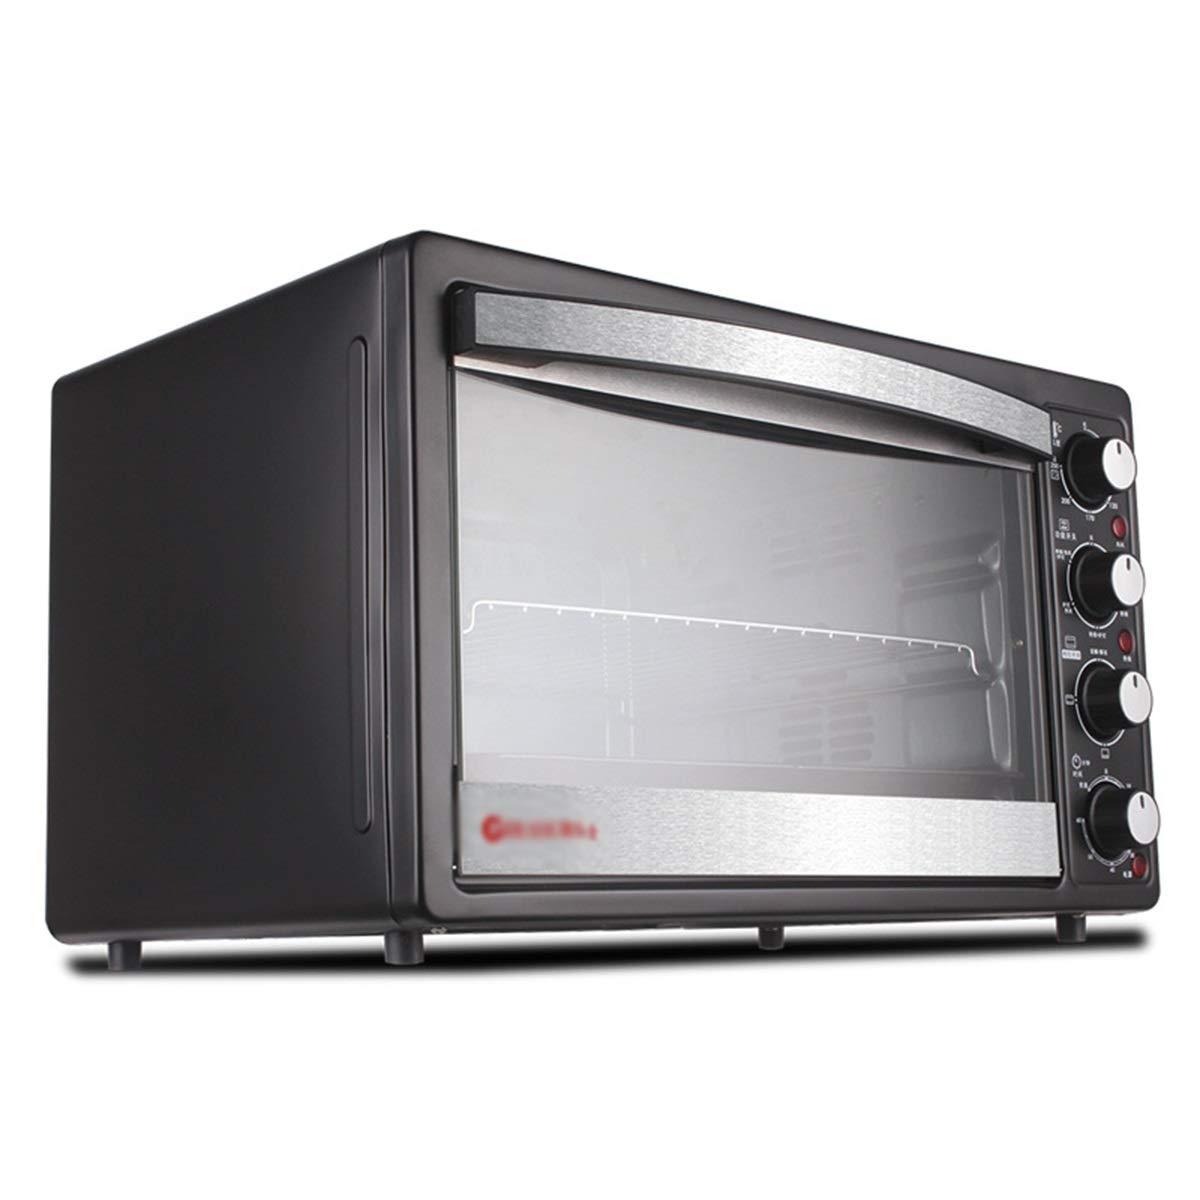 ZCYX ミニオーブン - 多機能オーブン35 L電気オーブンフル装備のホーム上下精密温度制御オーブン -7487 オーブン B07RWLZFX2